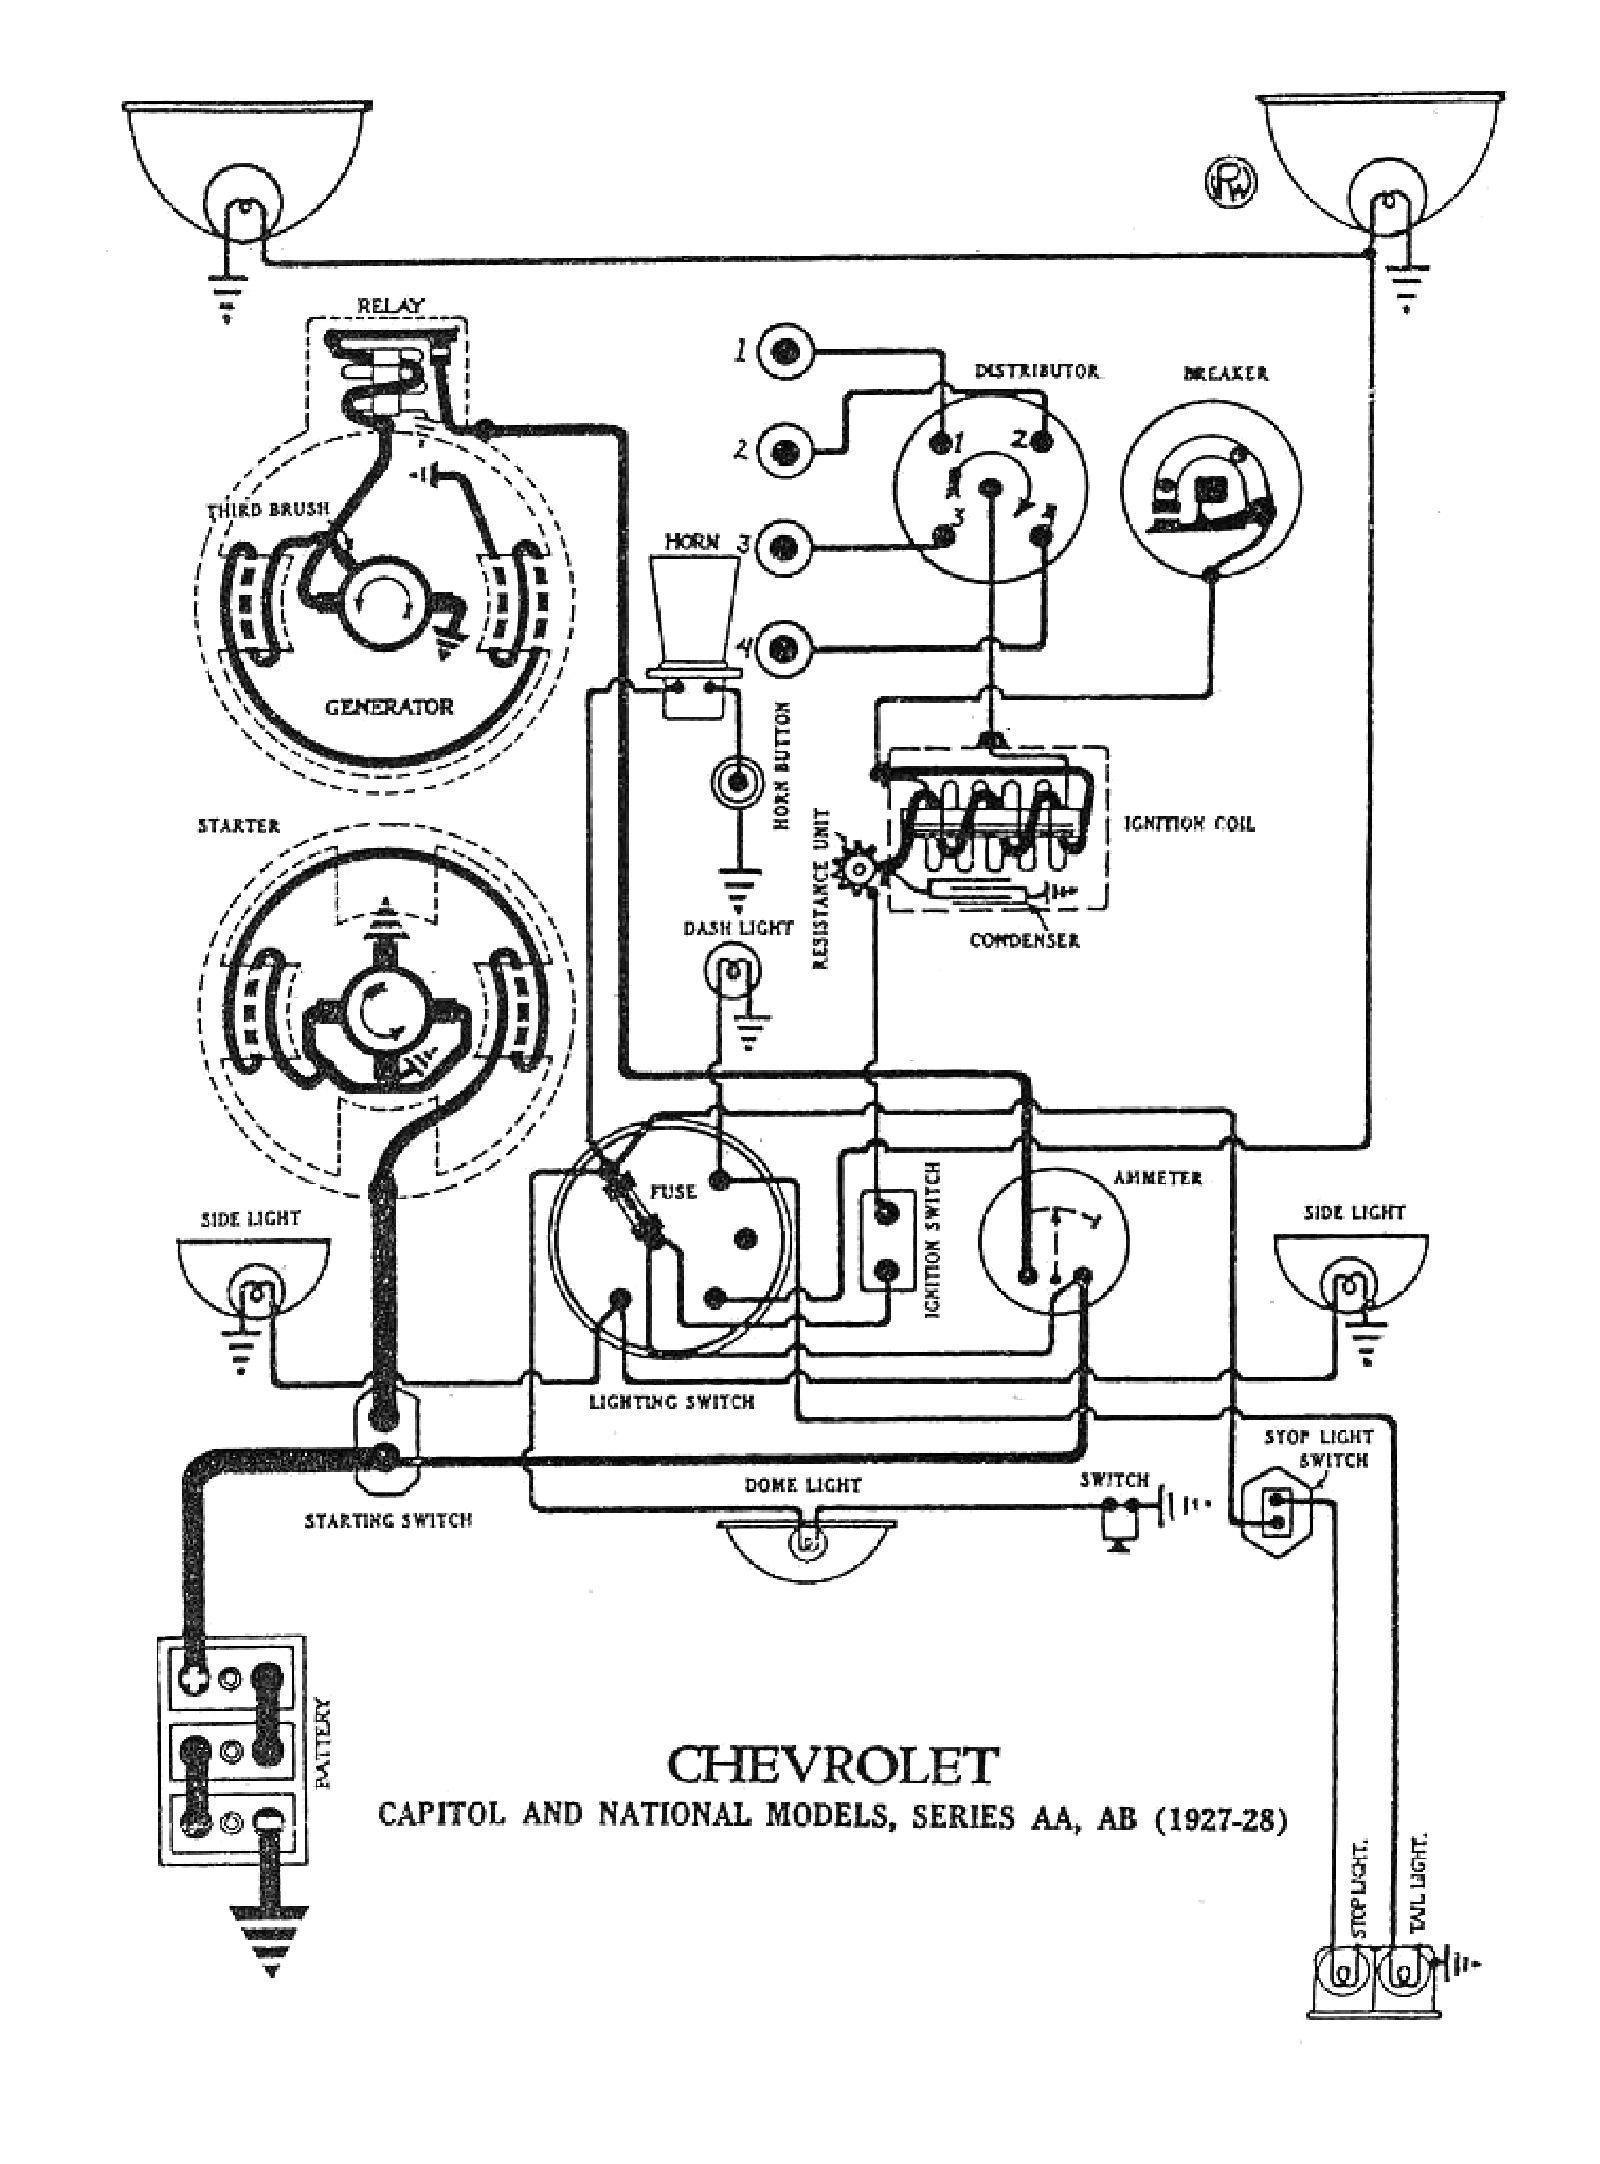 chevy truck underhood wiring diagrams